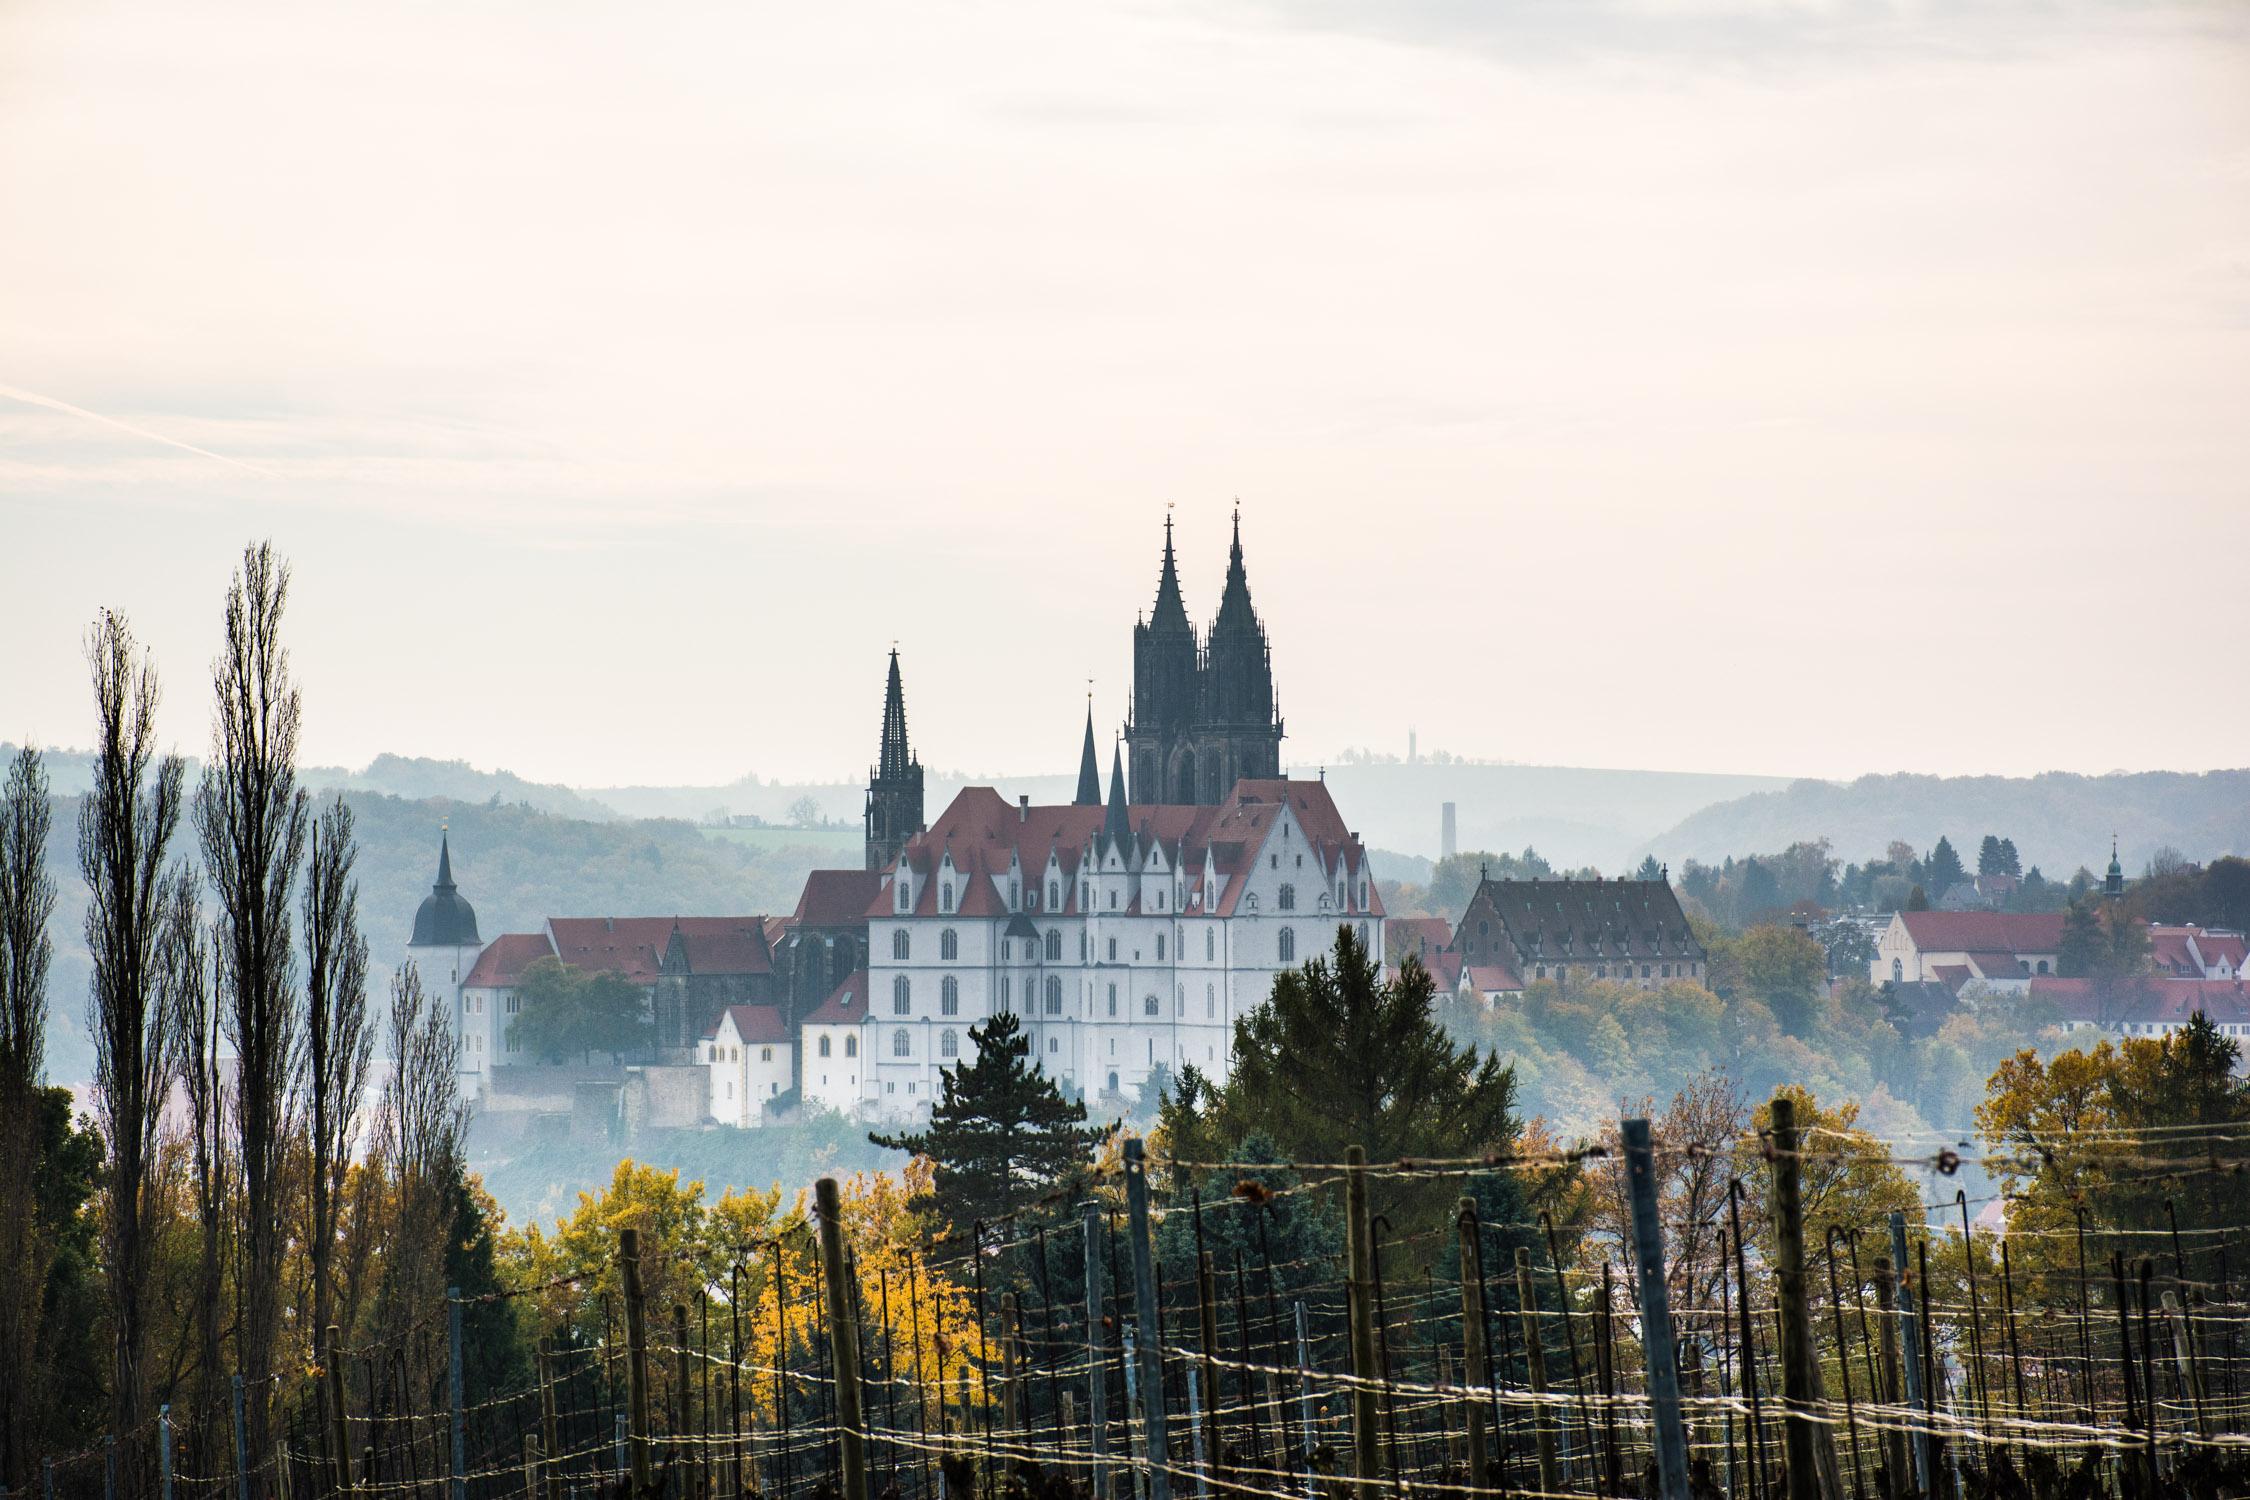 Botanischer Garten Dresden Genial Visiting the Schloss Proschwitz Winery In Meissen Germany